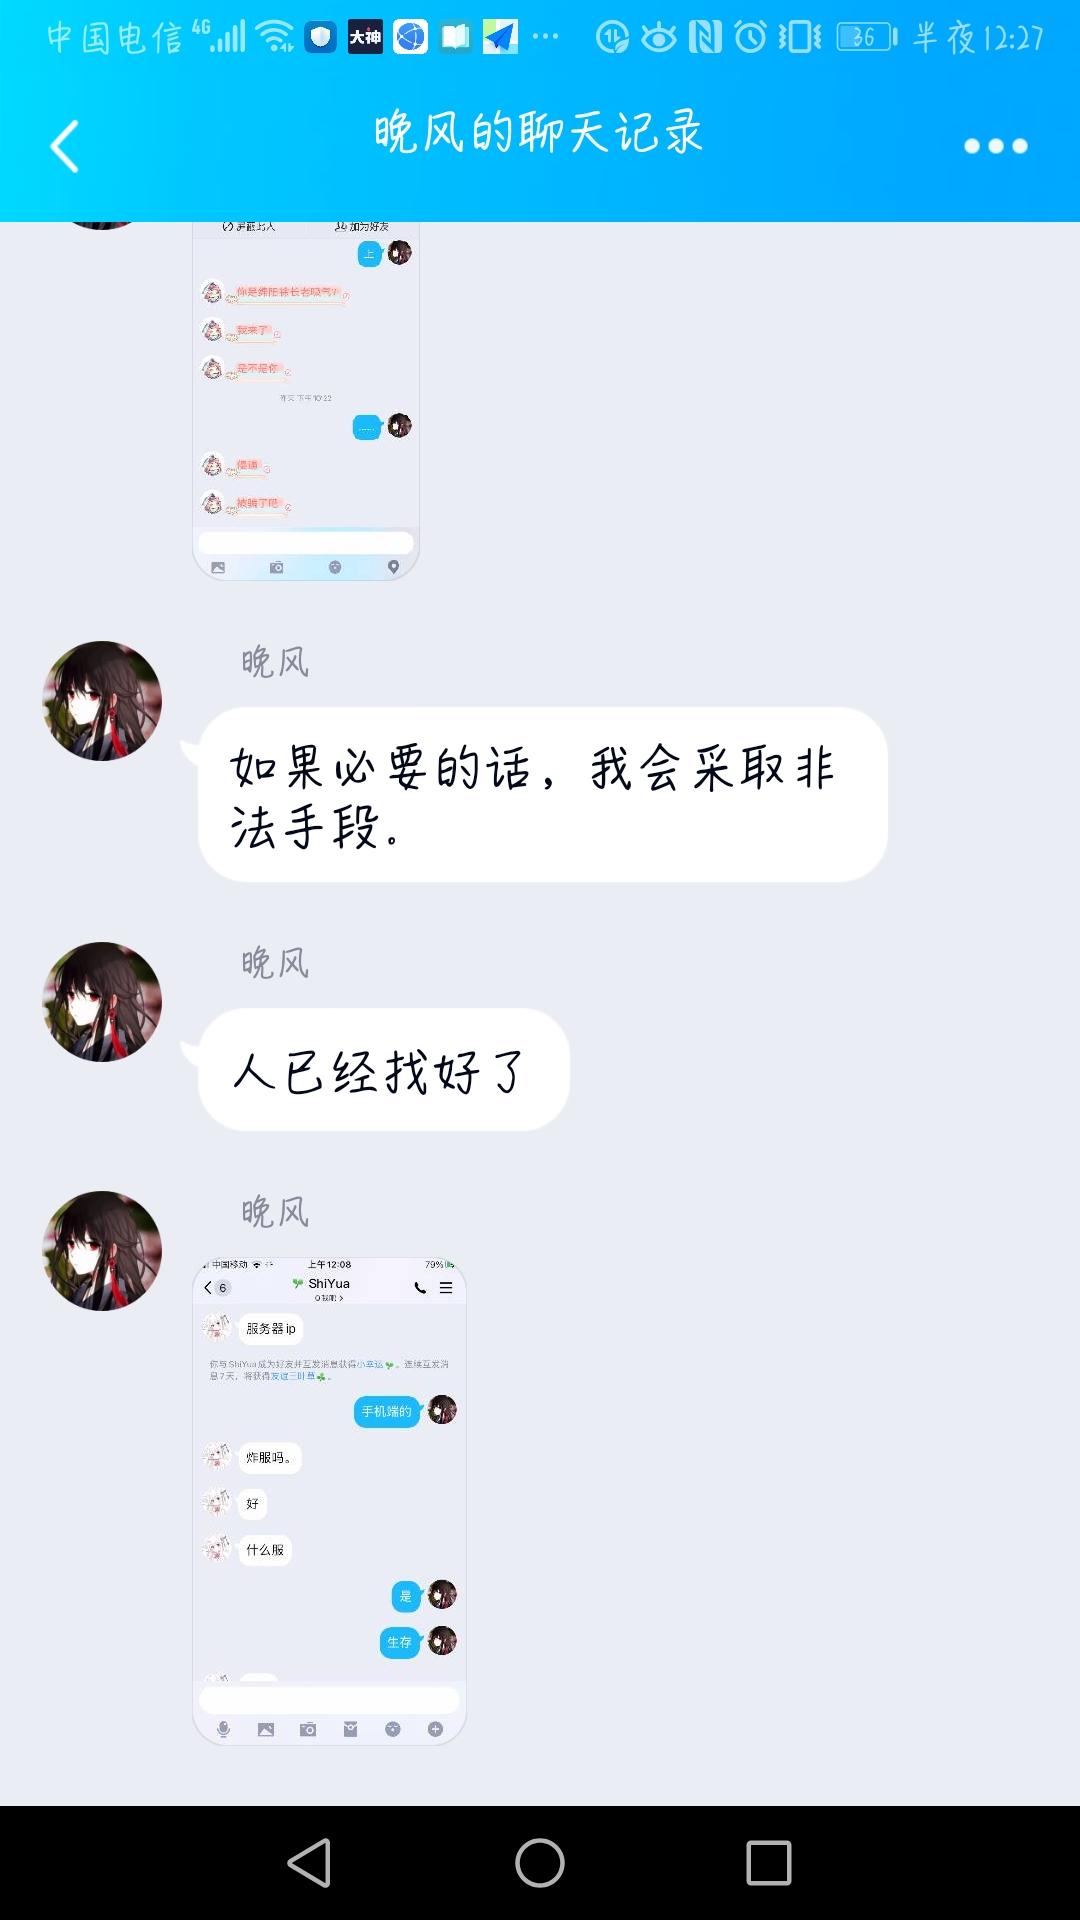 Screenshot_20210623_002737_com.tencent.mobileqq.jpg